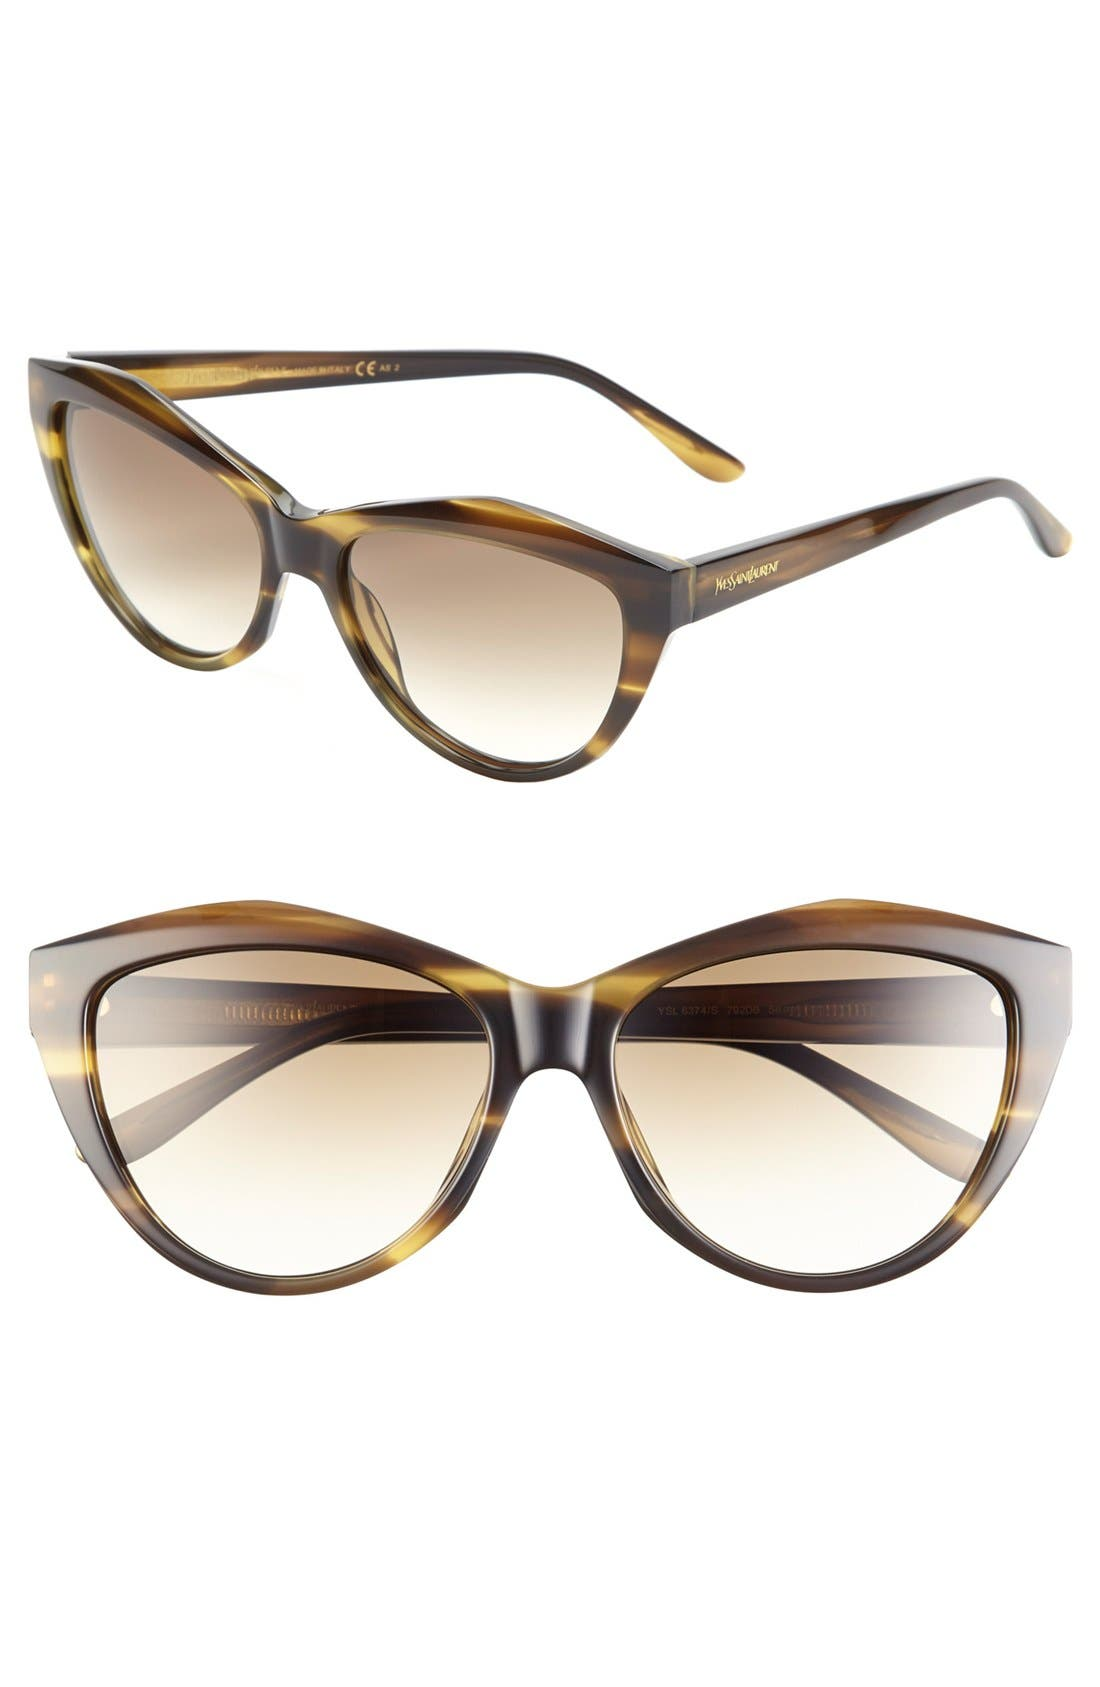 Main Image - Saint Laurent 56mm Cat Eye Sunglasses